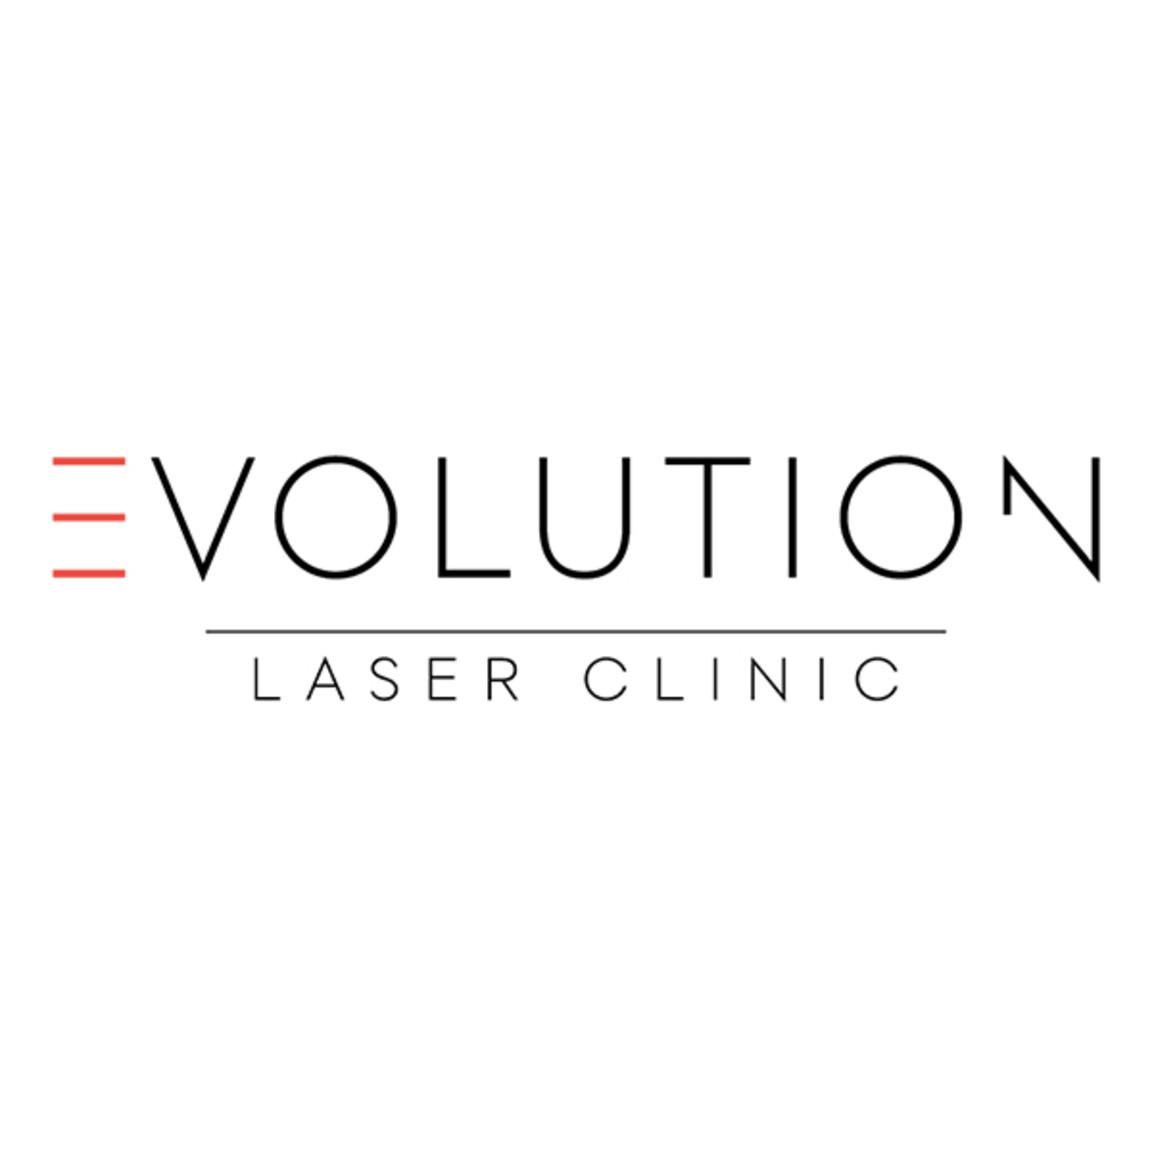 Evolution Laser Clinic at Westfield Mt Druitt